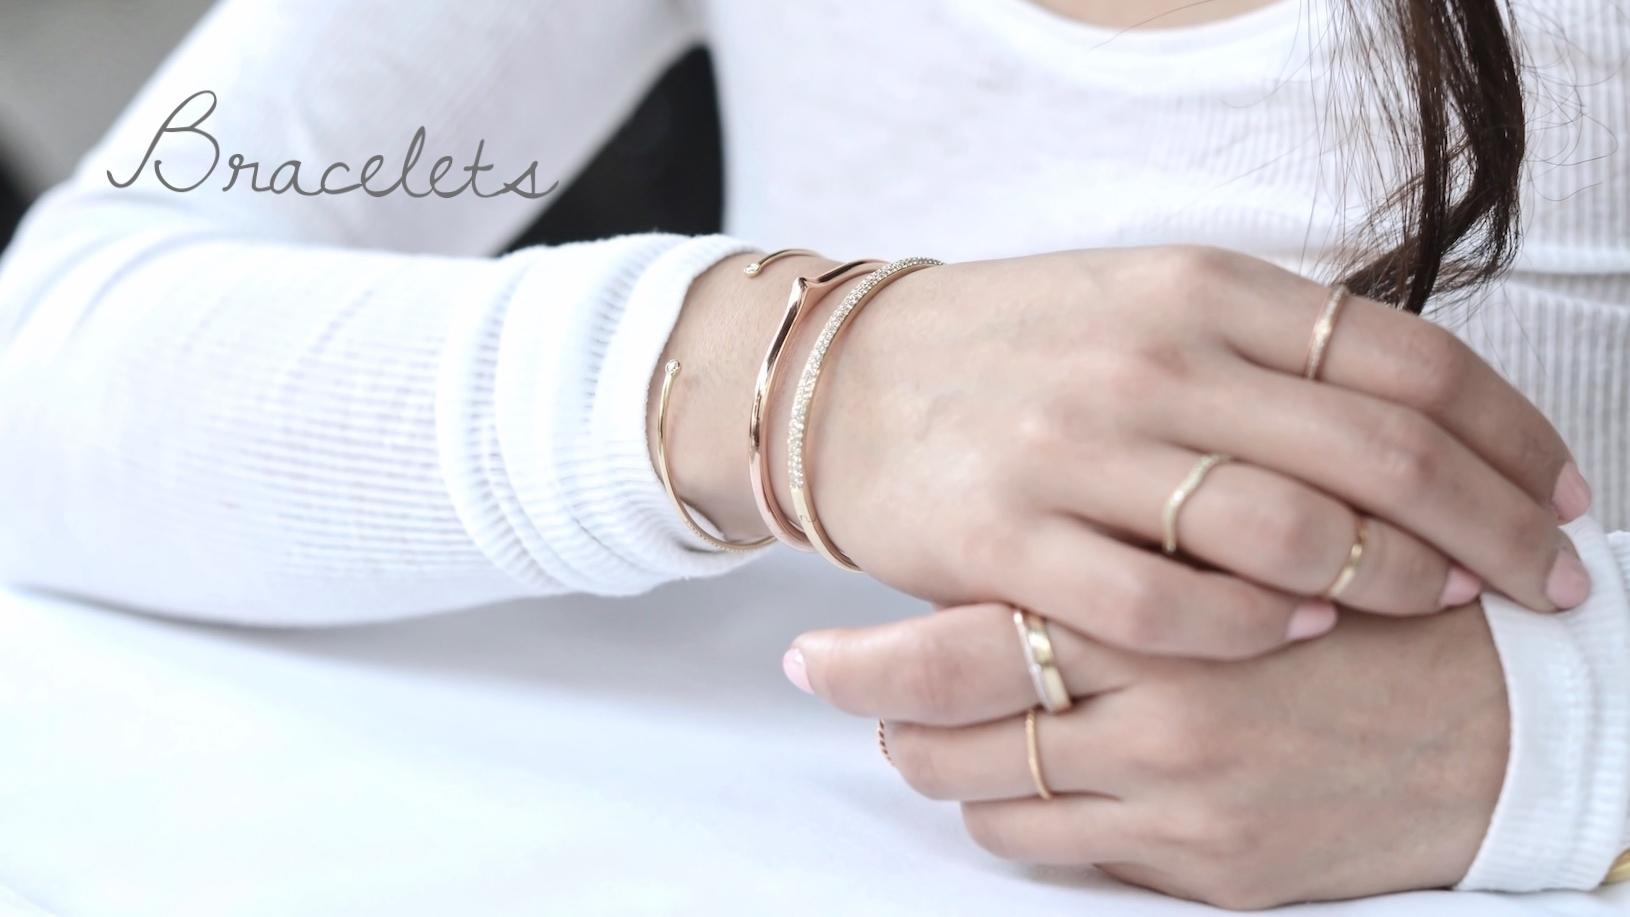 clove and ele fine jewelry designs - Classic Diamond Cuff - Classic Diamond Bangle-Wishbone Bangle.jpg